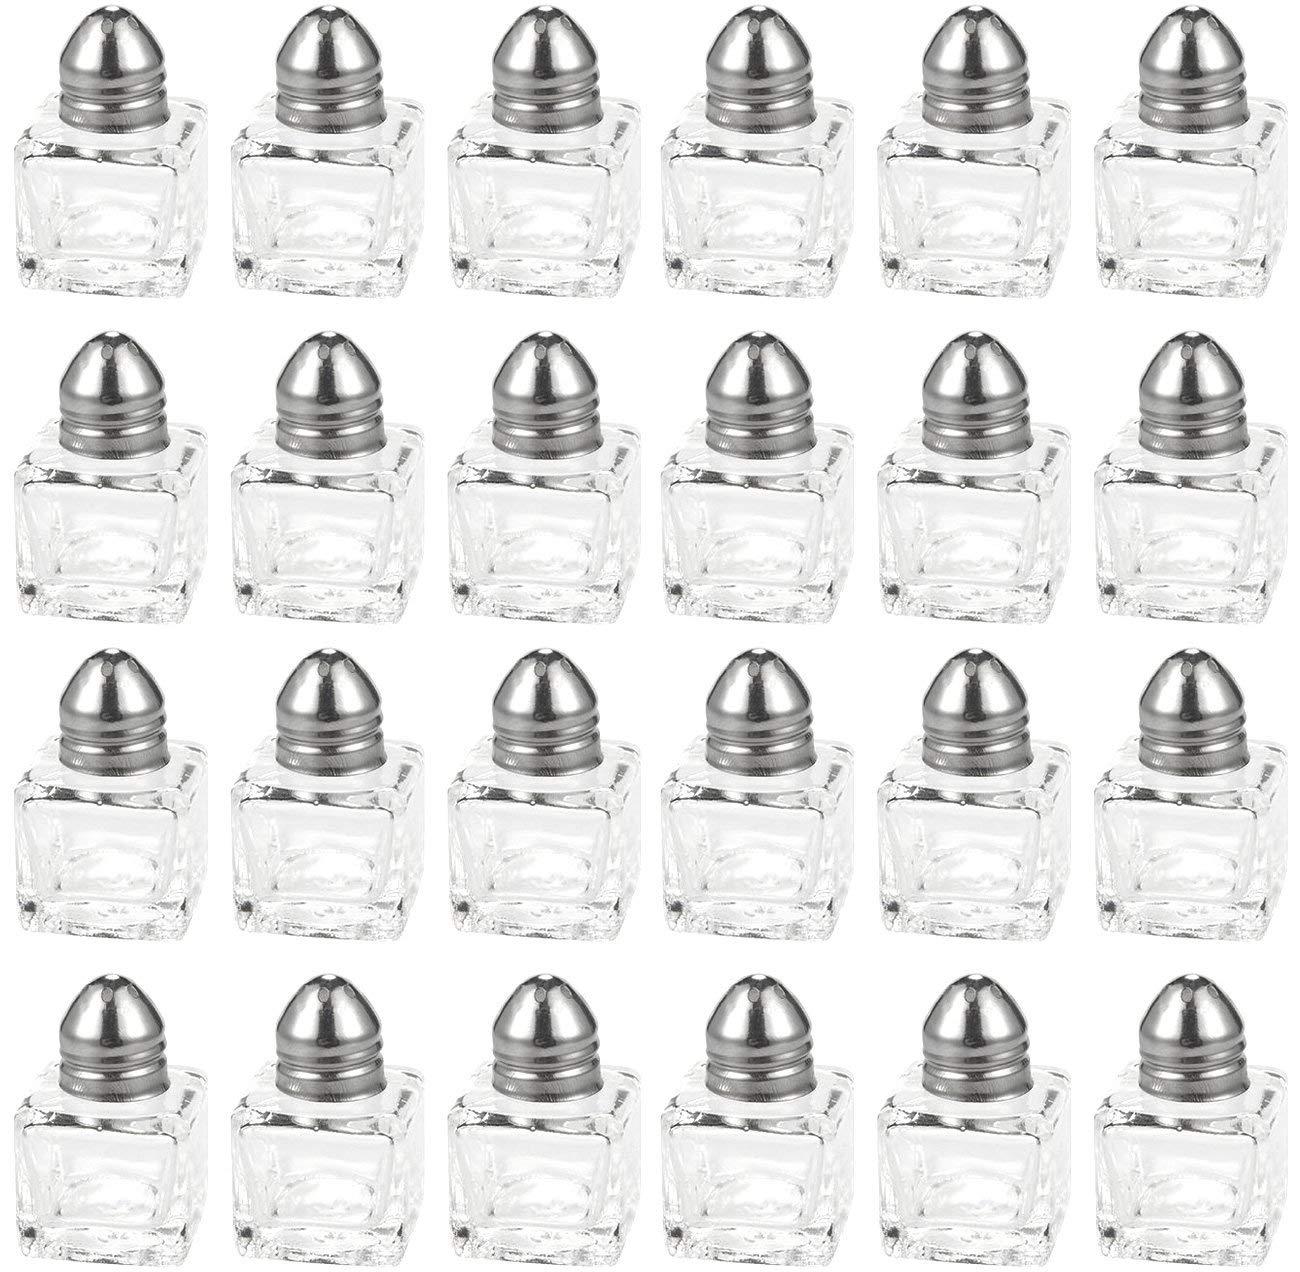 Srenta Mini Salt & Pepper Shakers Set | Classic Design Transparent Glass Kitchenware | Essential Dining Table Refillable Tool | 0.5 Oz. Set of 24 by Srenta